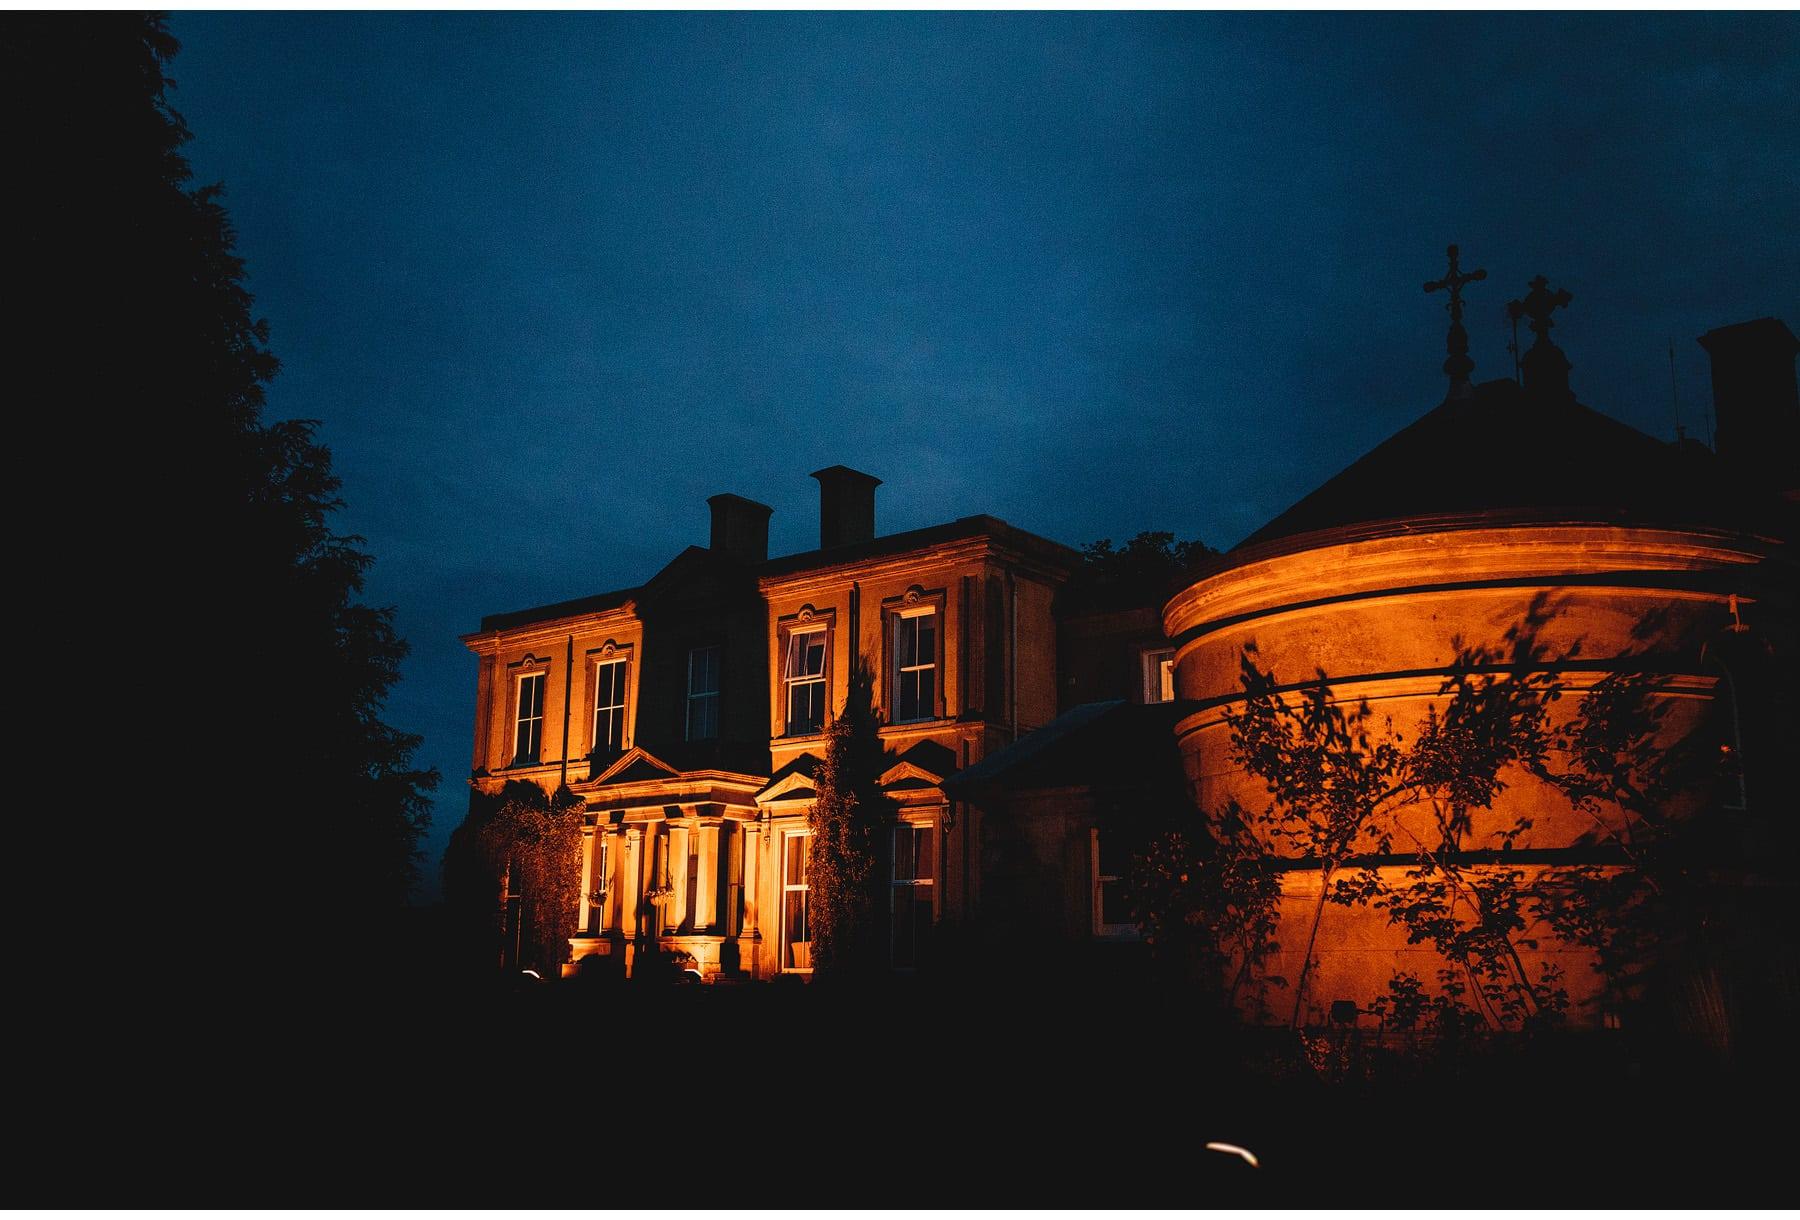 Hothorpe Hall weddings at night